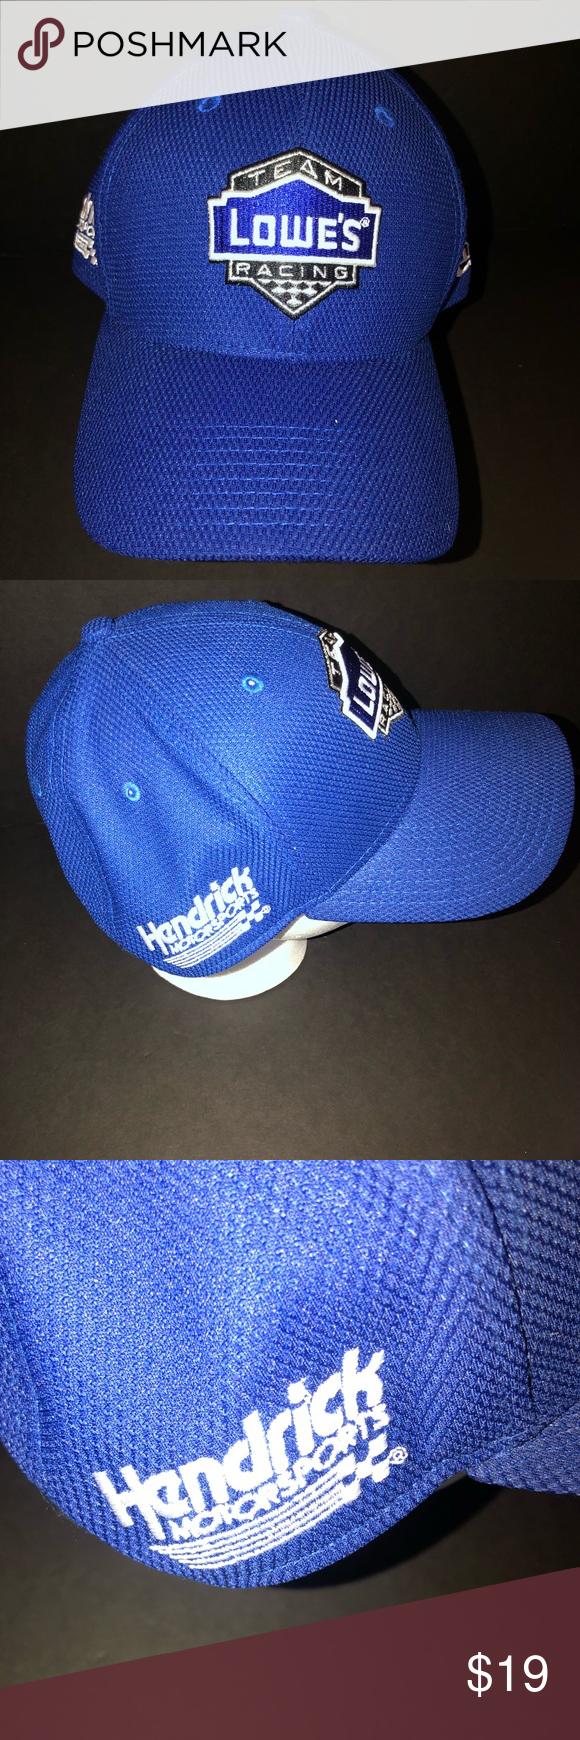 696fa78a New era Hendrick Motorsports #48 nascar hat Brand new High quality Stitched One  size hat New Era Accessories Hats